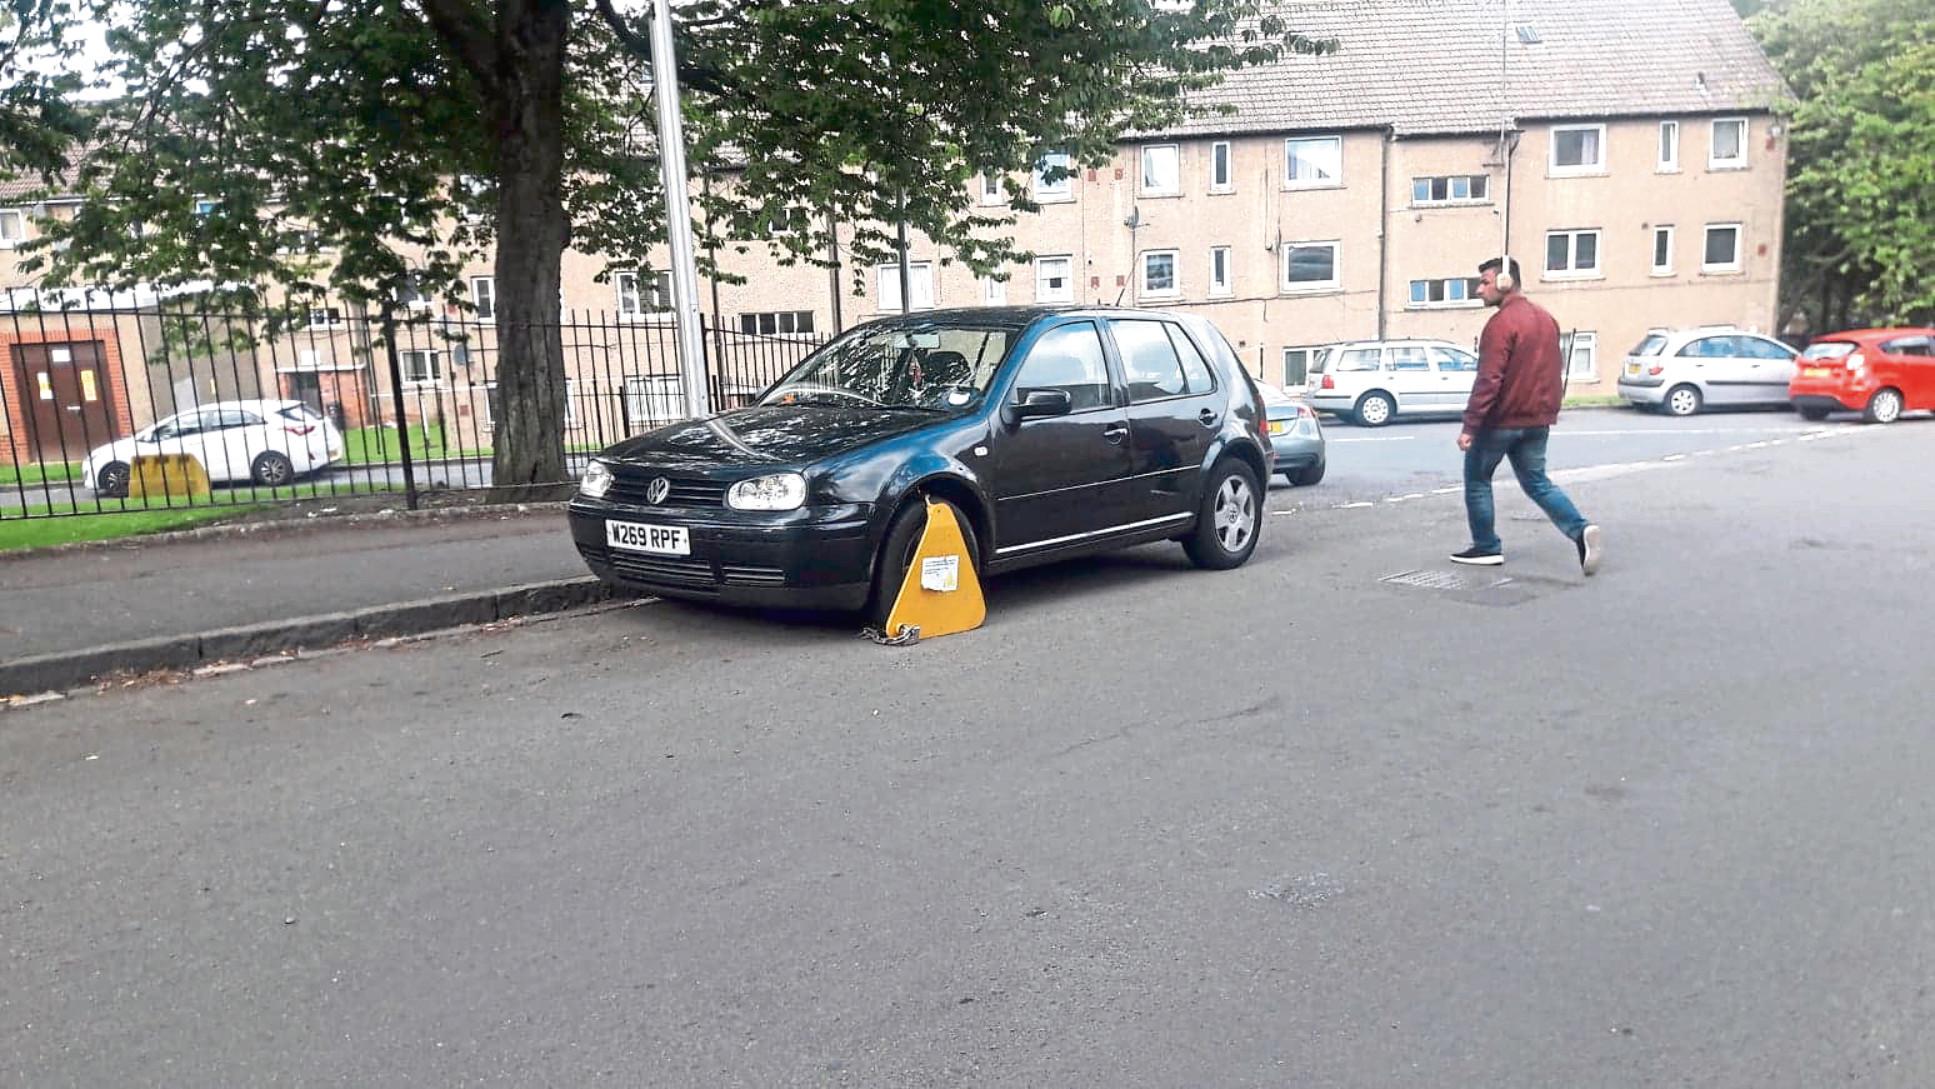 A clamped car on Saggar Street